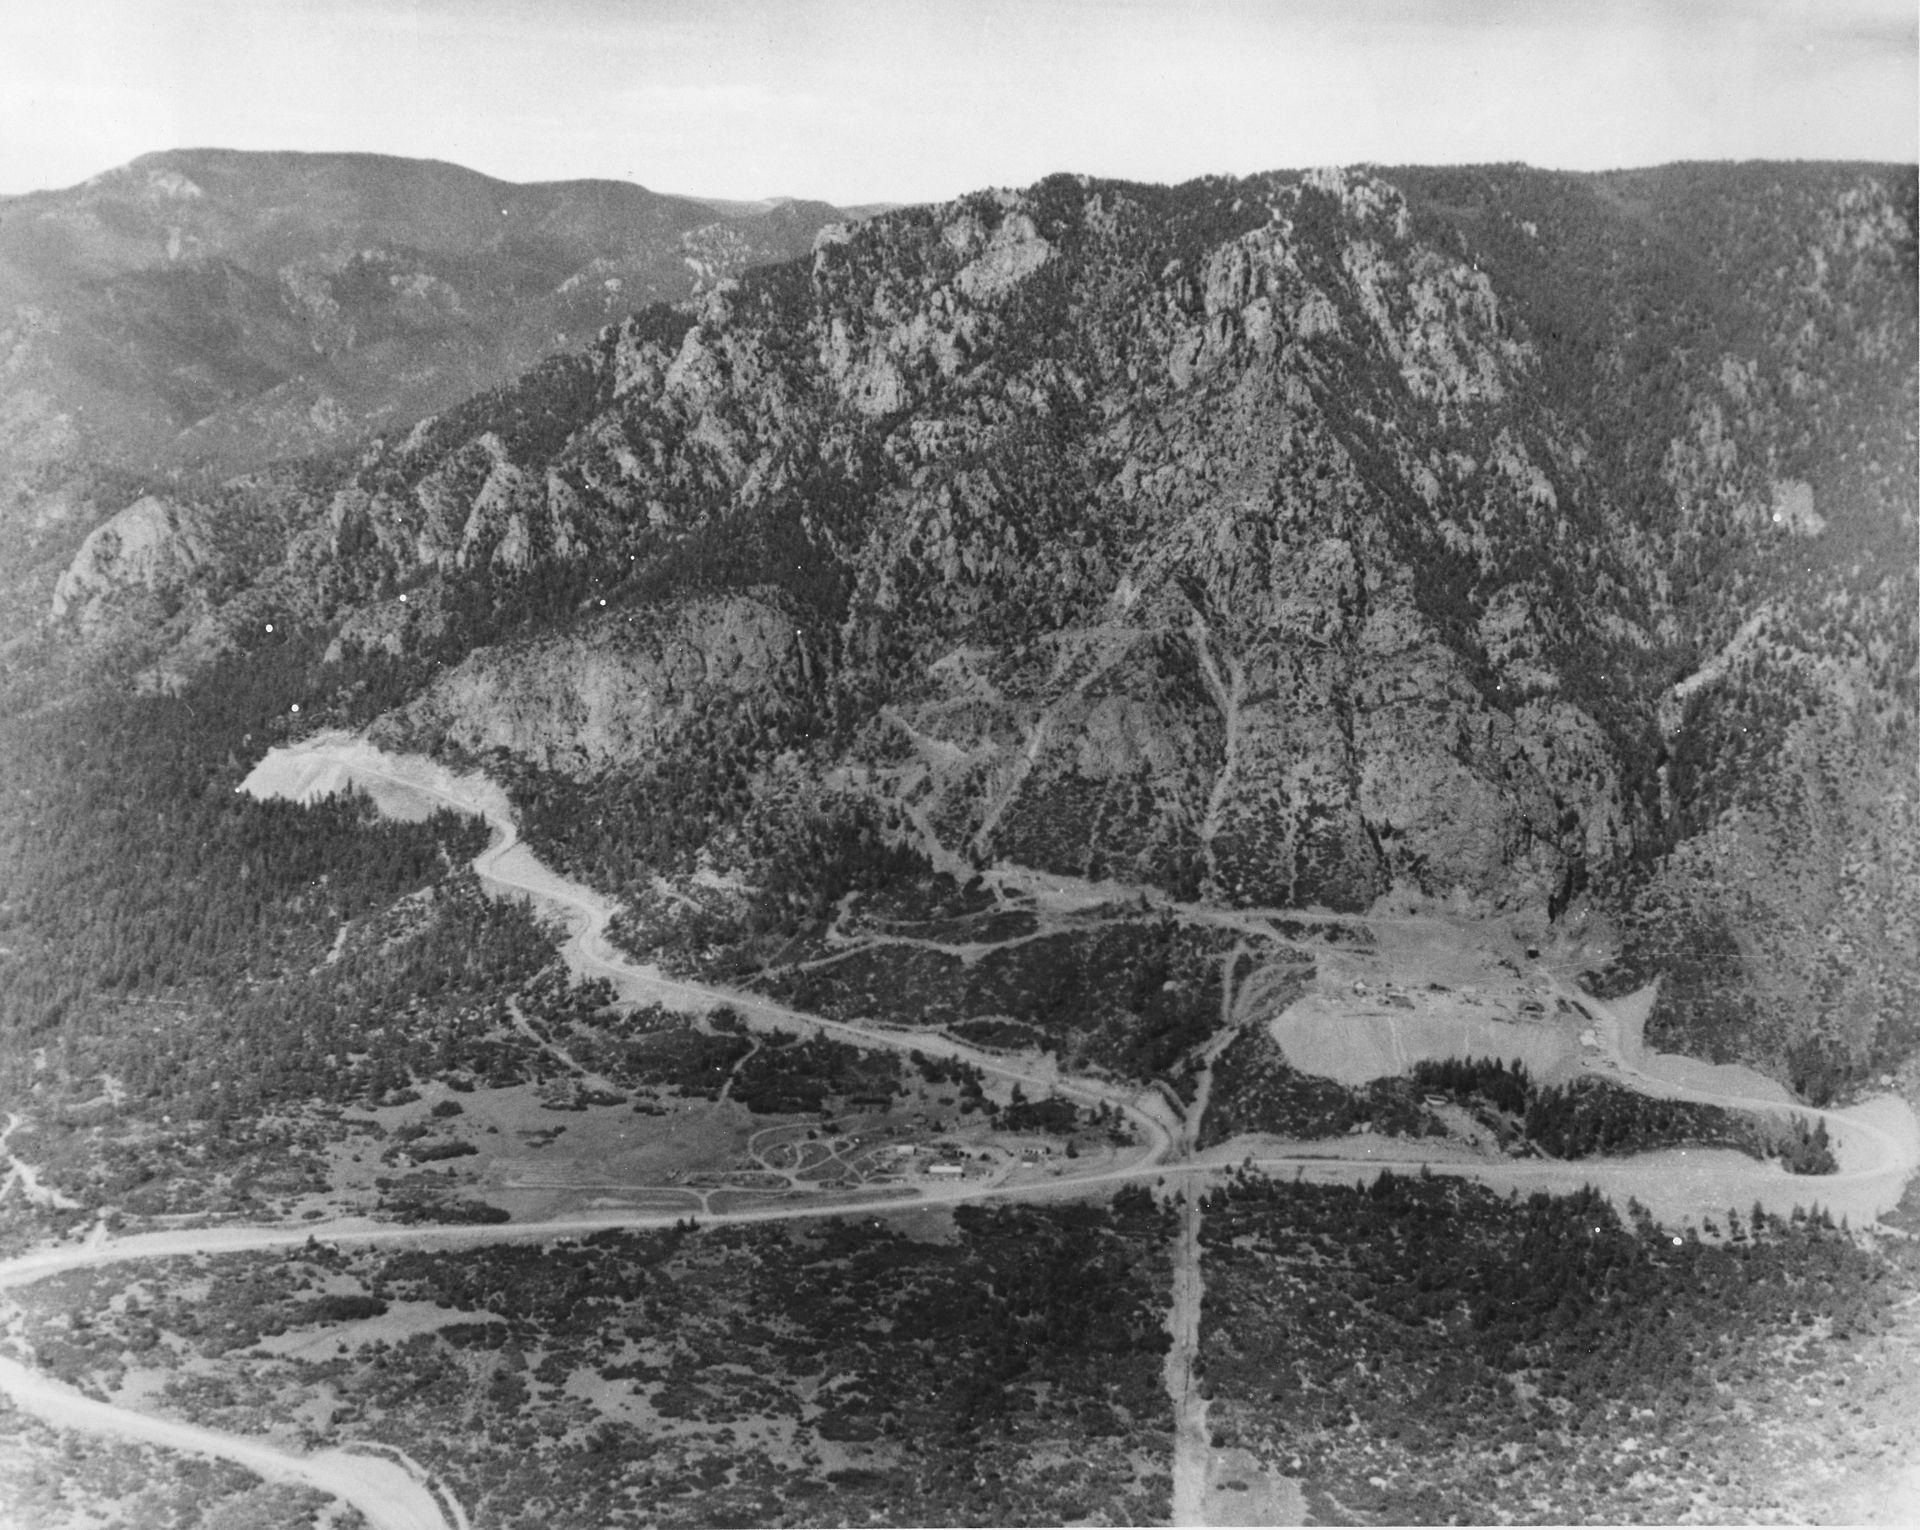 Cheyenne Mountain Complex Wikipedia